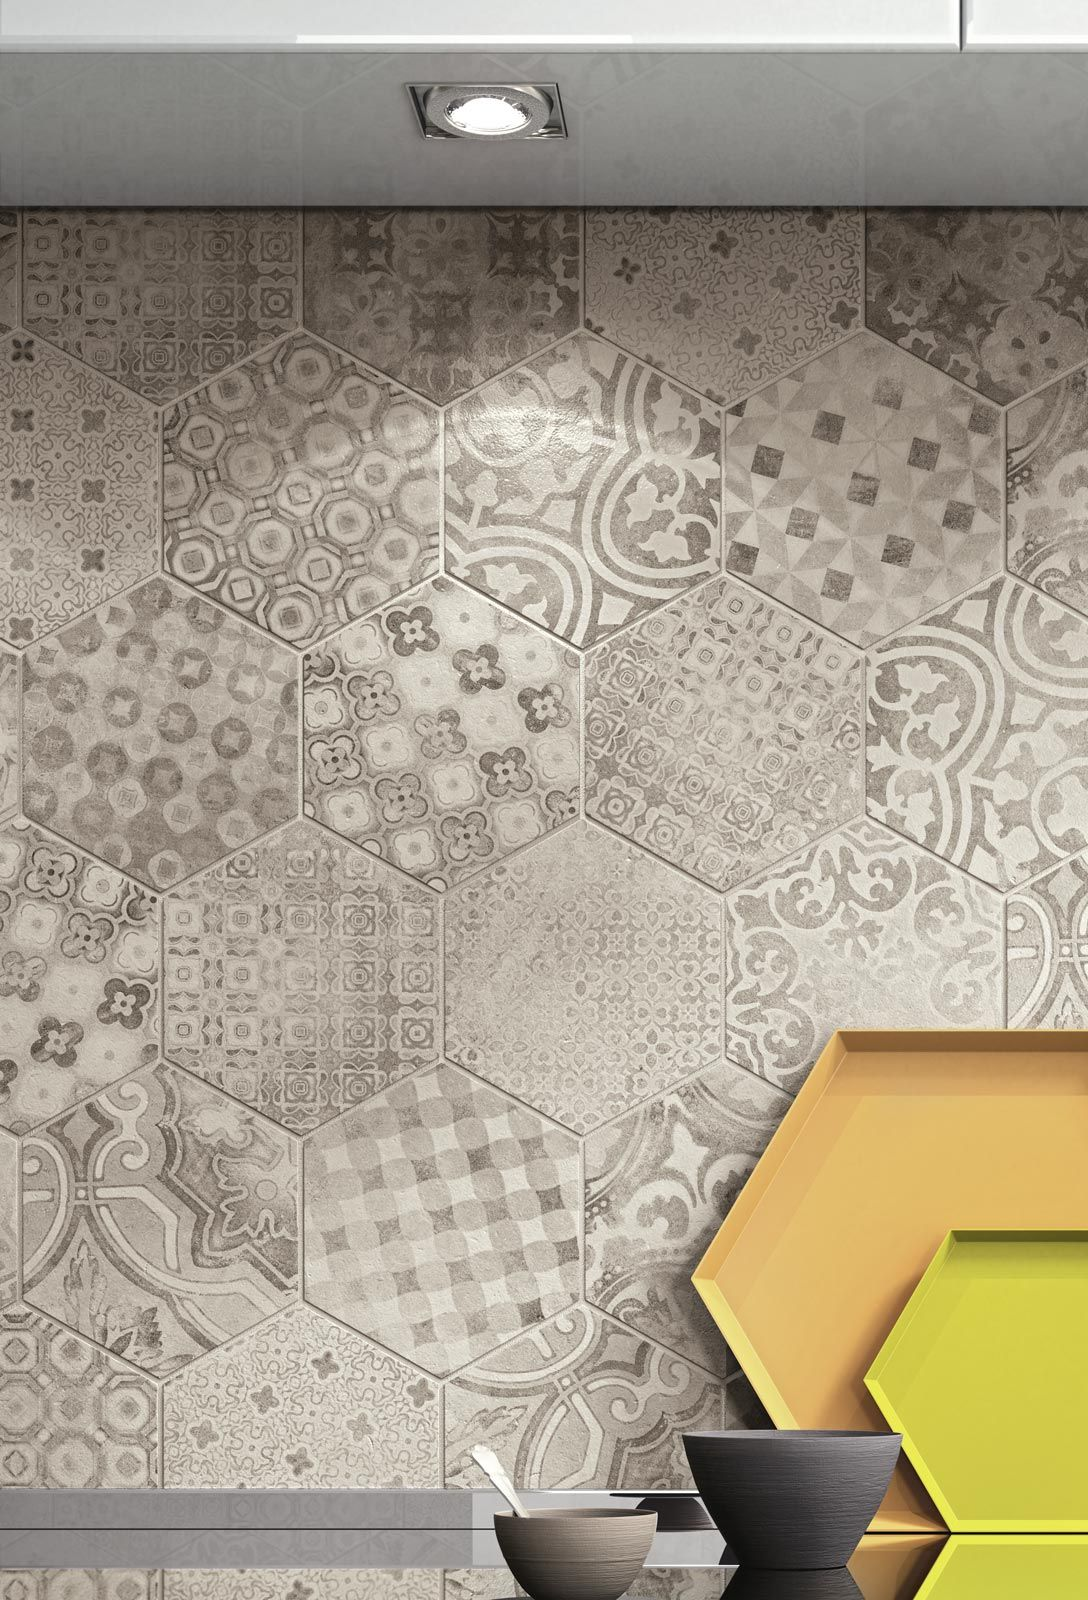 Rewind piastrelle effetto mosaico in gres porcellanato ragno irene pinterest tiles - Piastrelle a mosaico ...